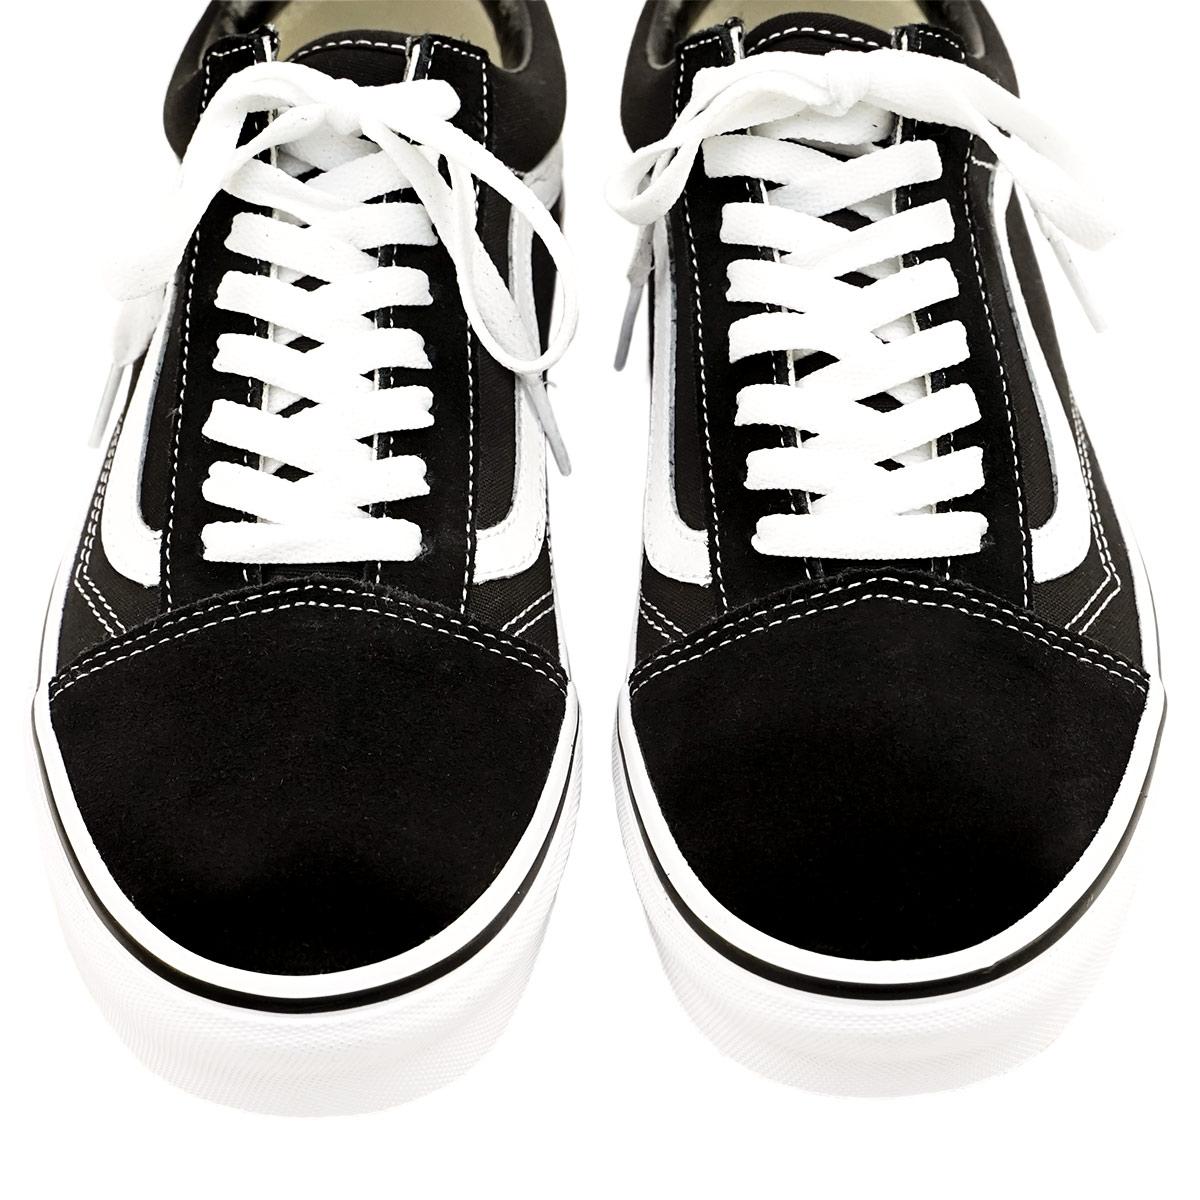 0f4b566f2 ... Vans VANS United States standard old school black / white (OLD SKOOL  JAZZ jazz BLACK